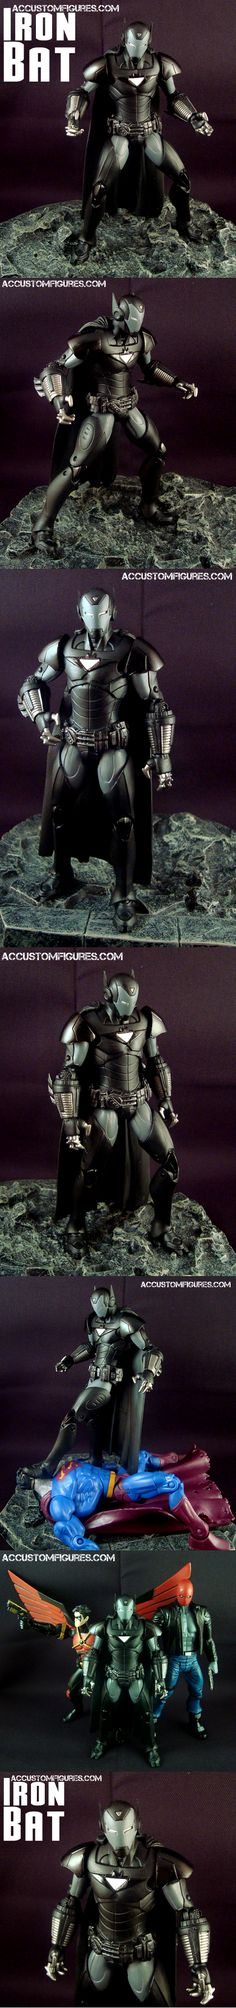 Iron..... he's a bat, his names iron btw